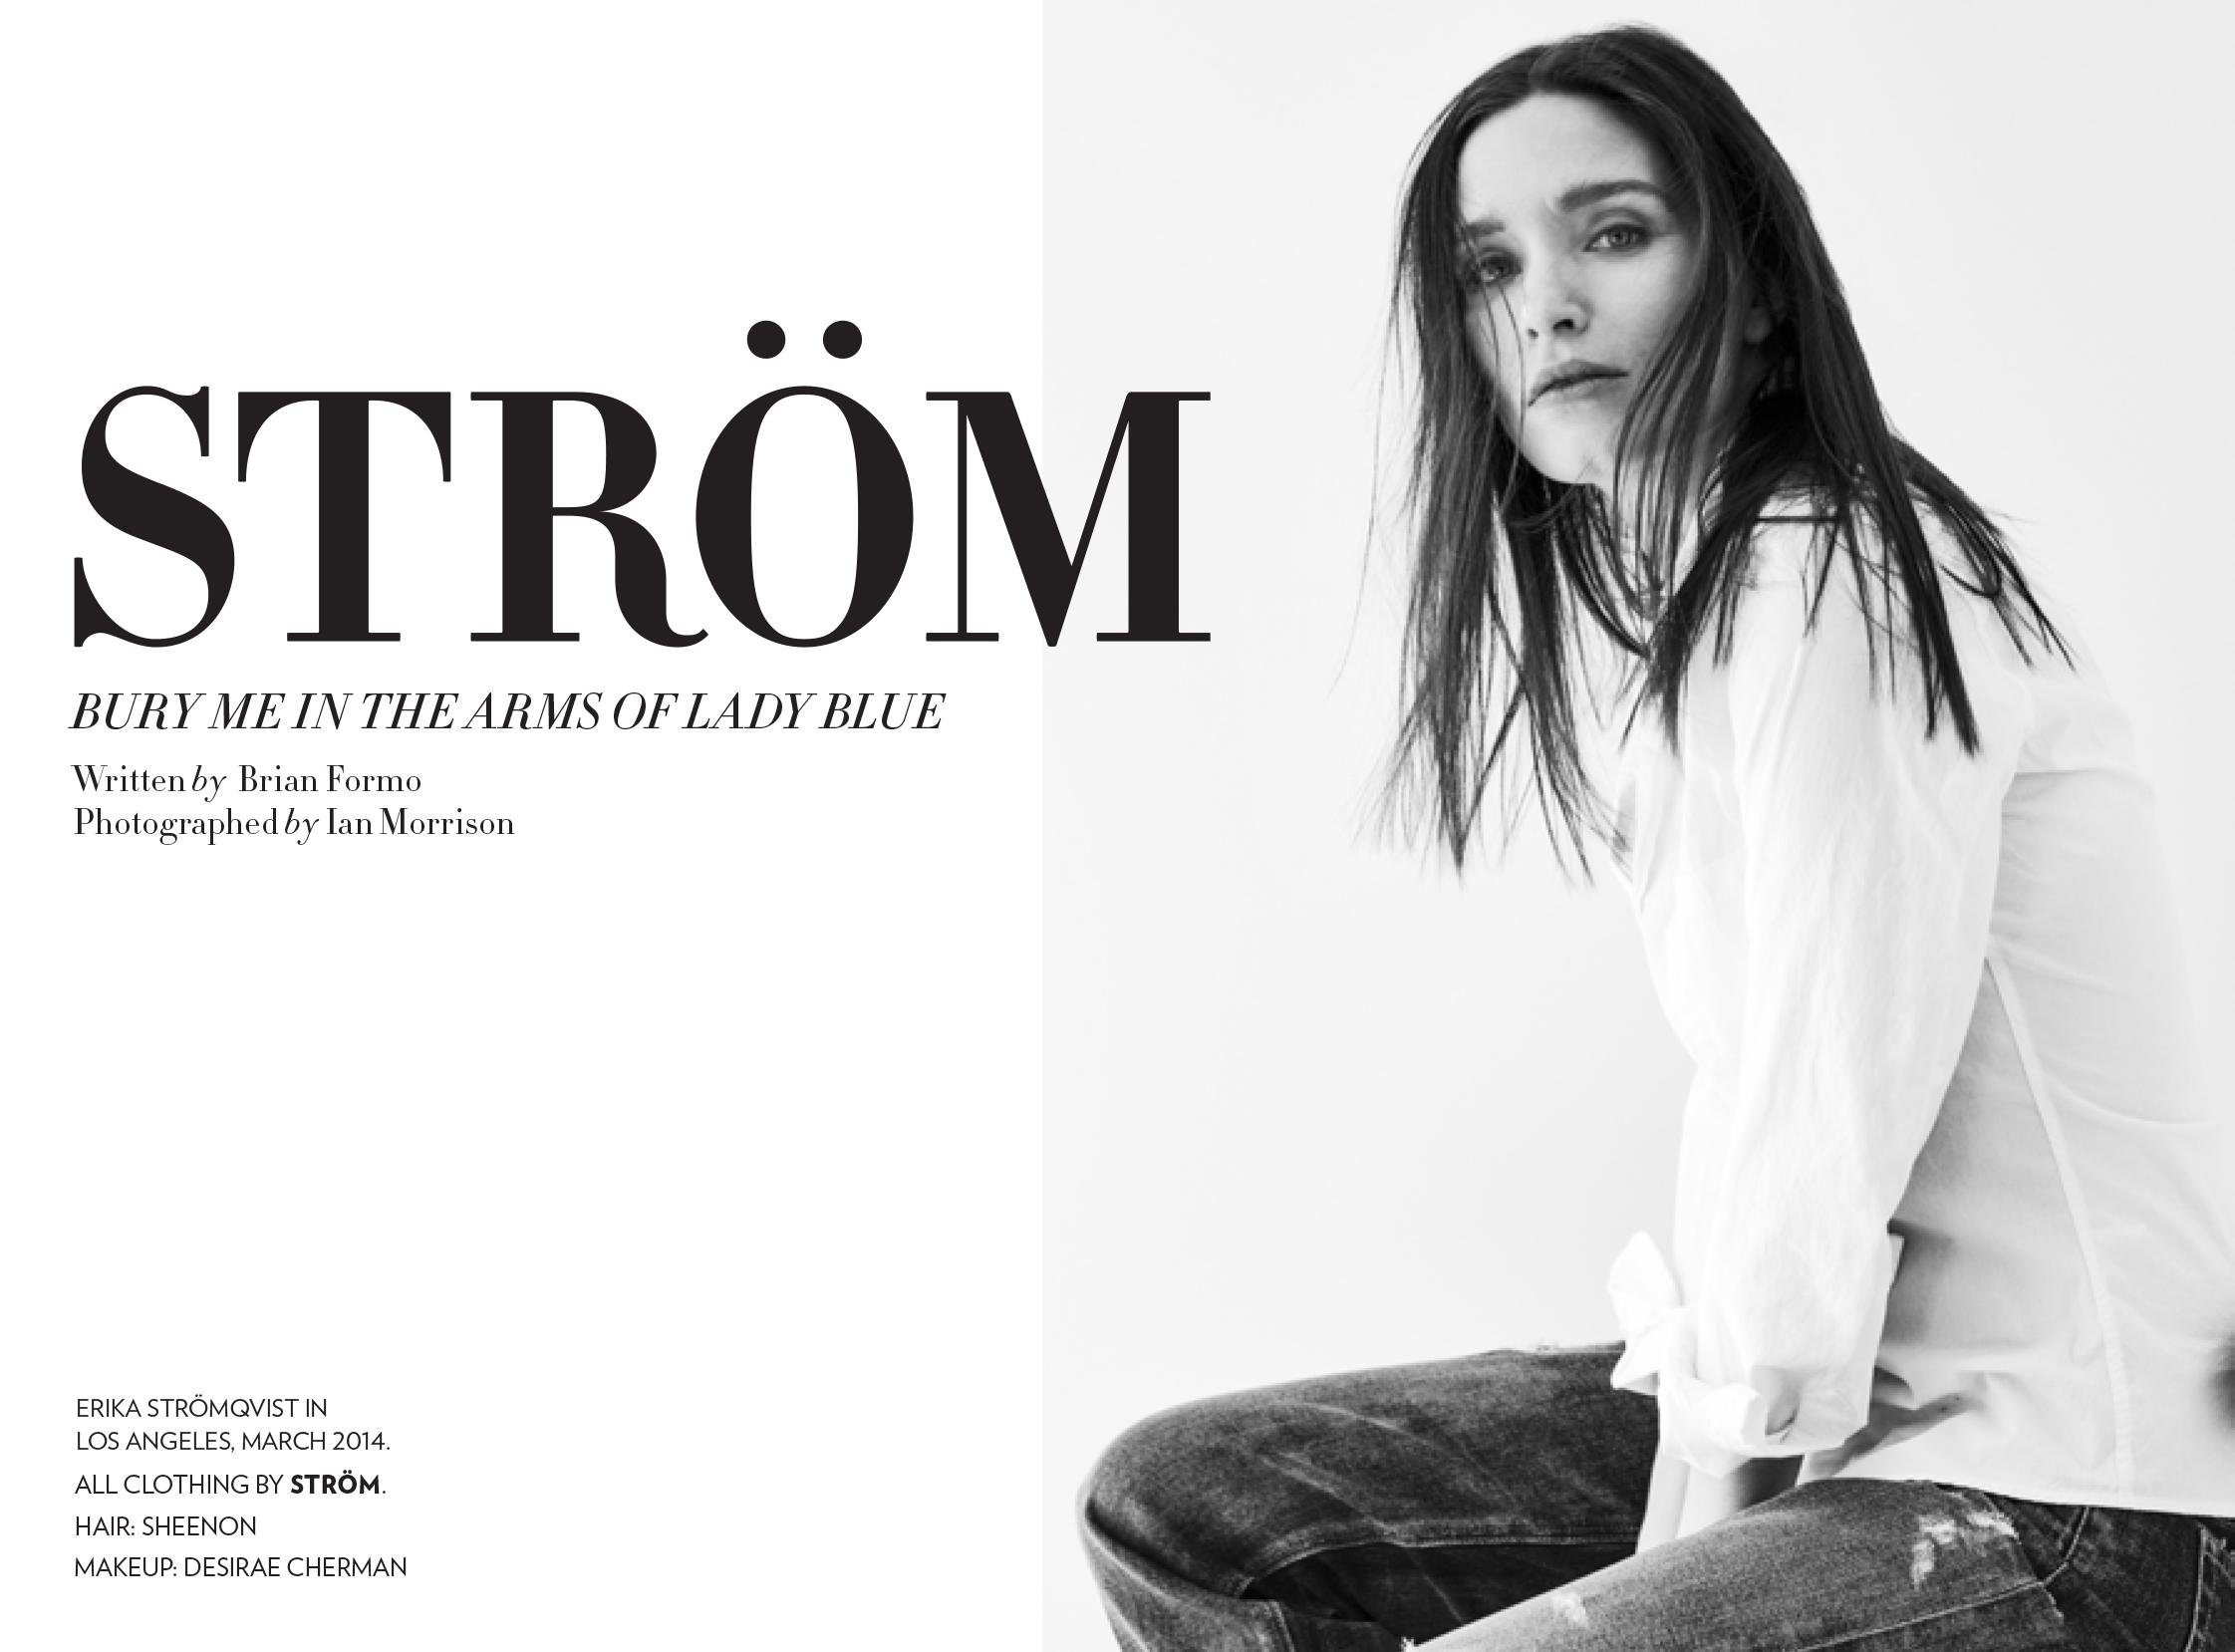 ErikaStromqvist-Flaunt-April2014-DEC SHE_1.jpg